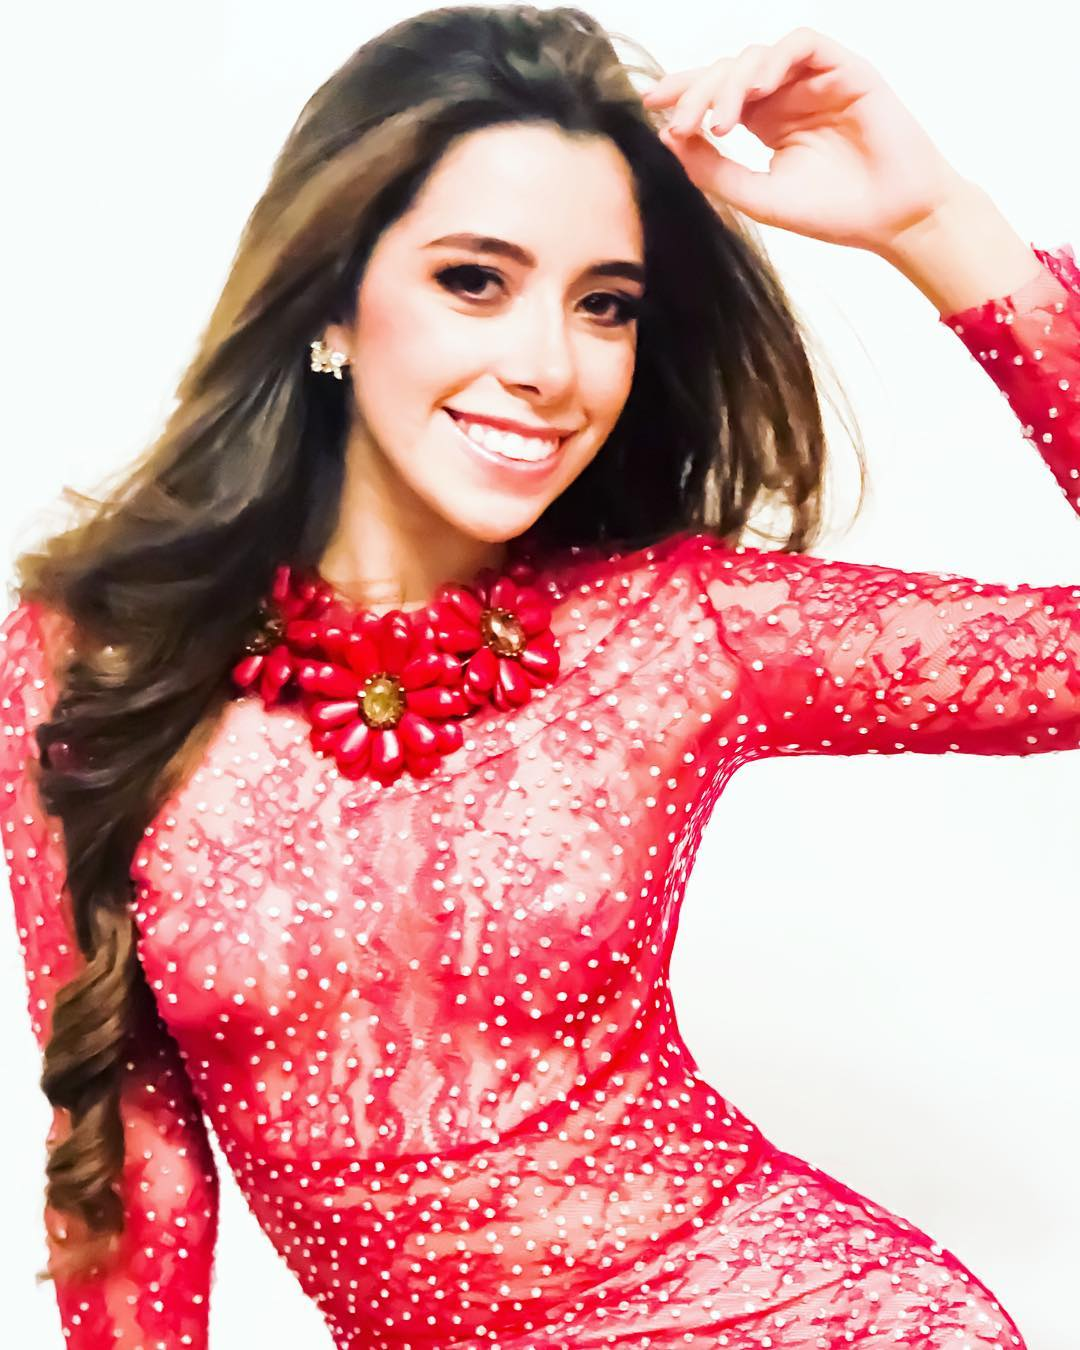 maya mejia ospina, miss teen mundial colombia 2019. 57024110